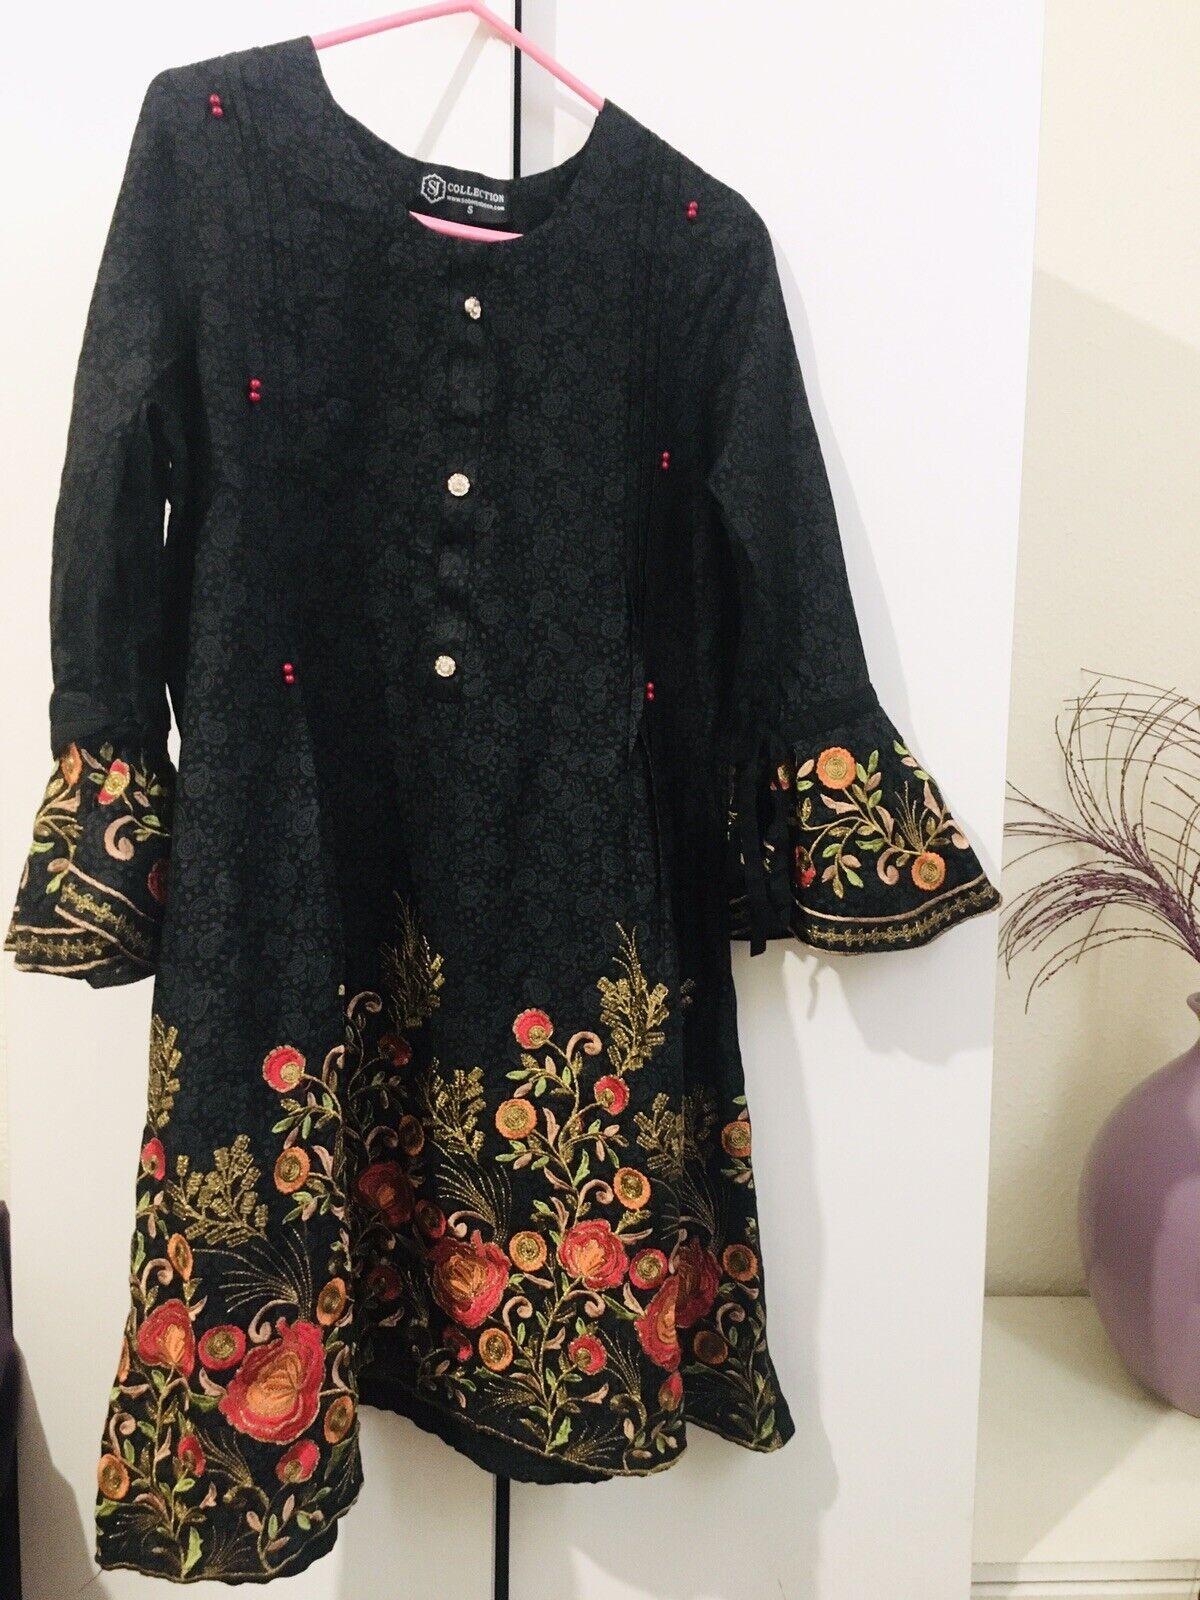 Ladies/ Girls Black Asian Dress/ Kurta Tunic Top With Embroidery Size Small